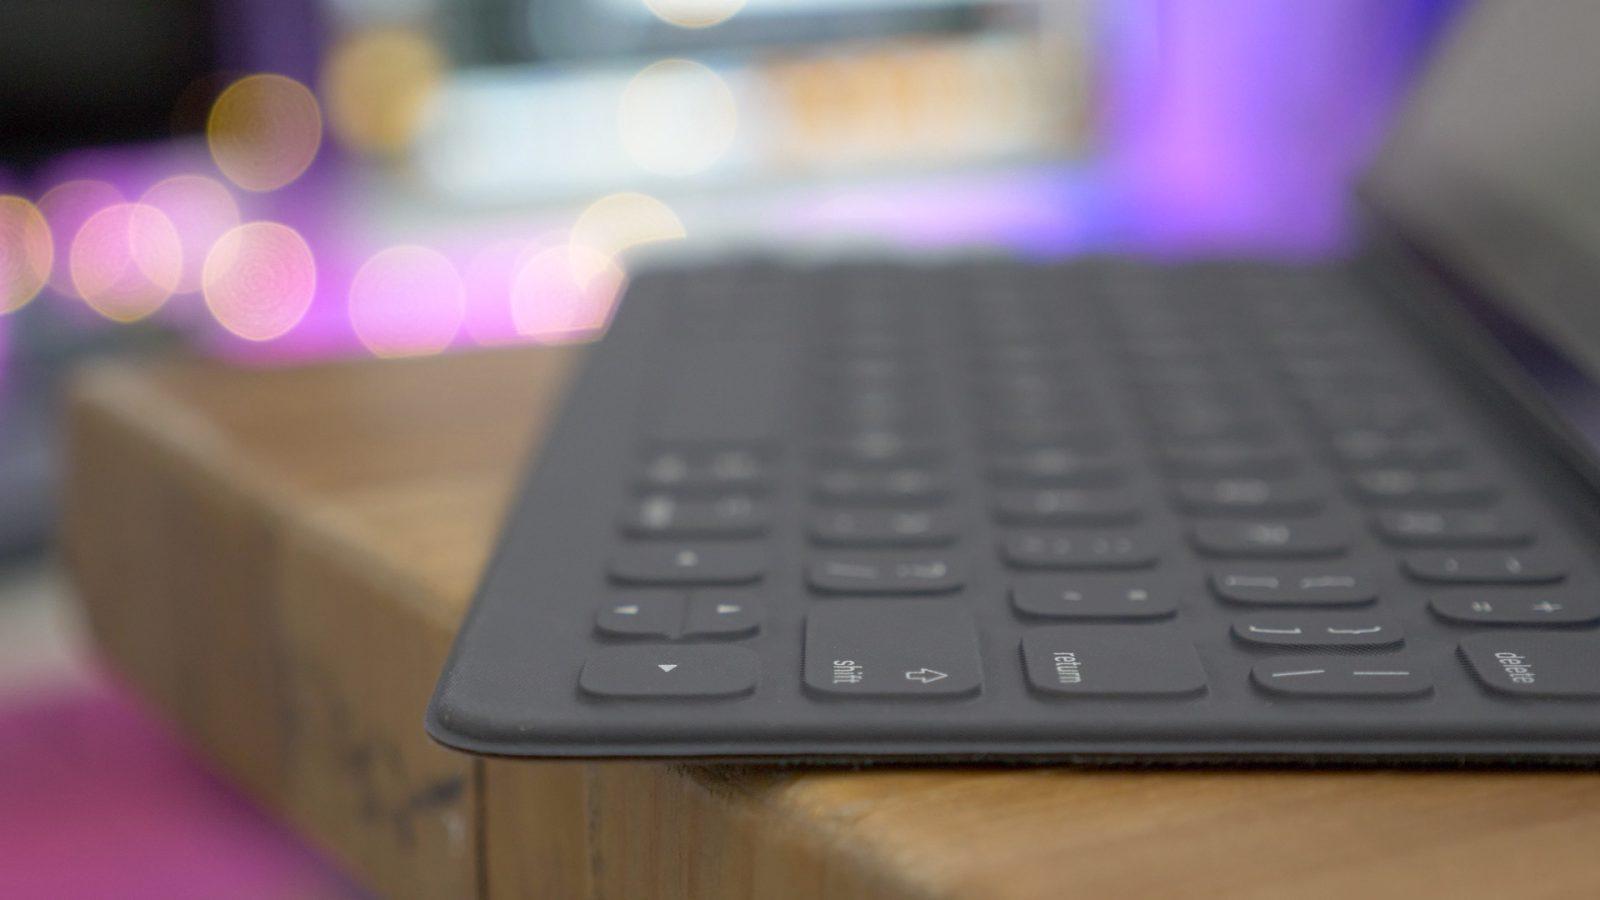 Smart Keyboard - 9to5Mac